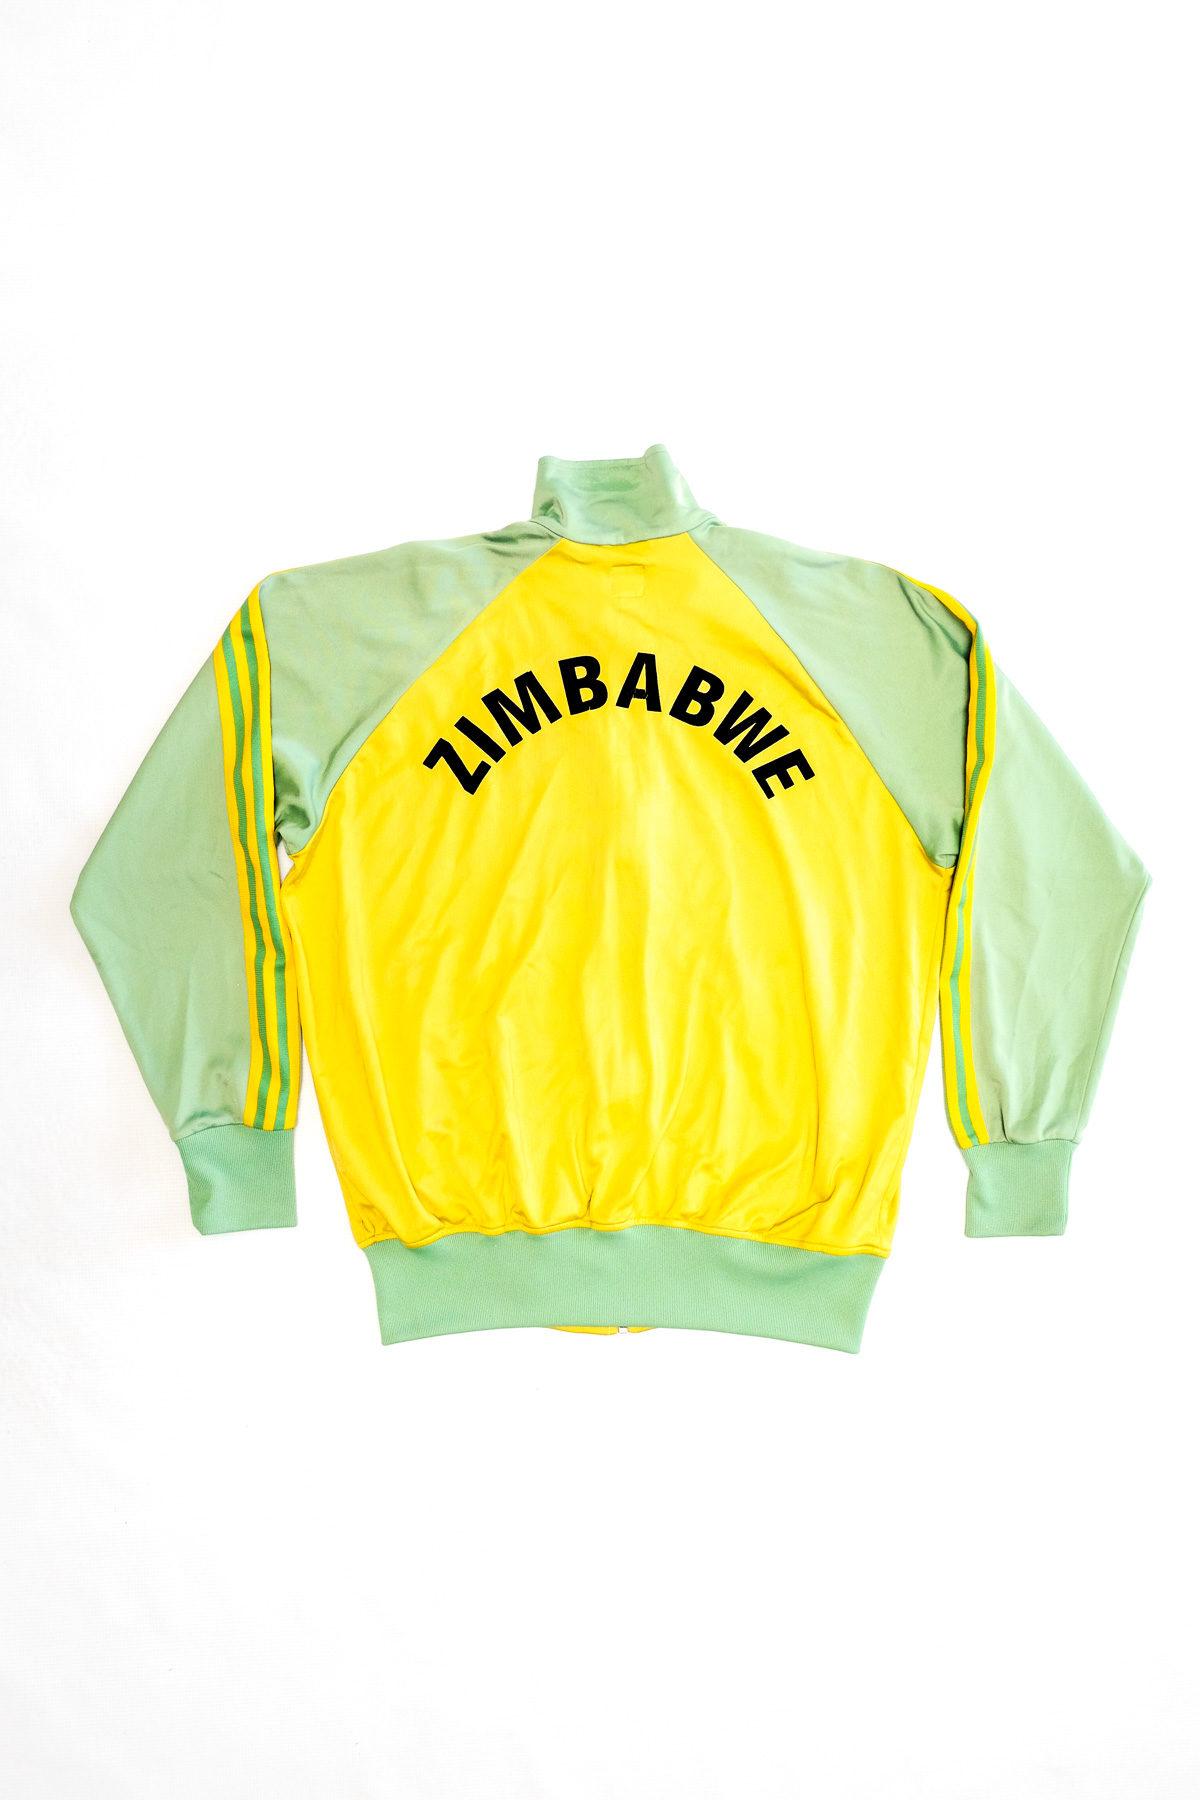 Adidas FELPA VINTAGE Zimbabwe